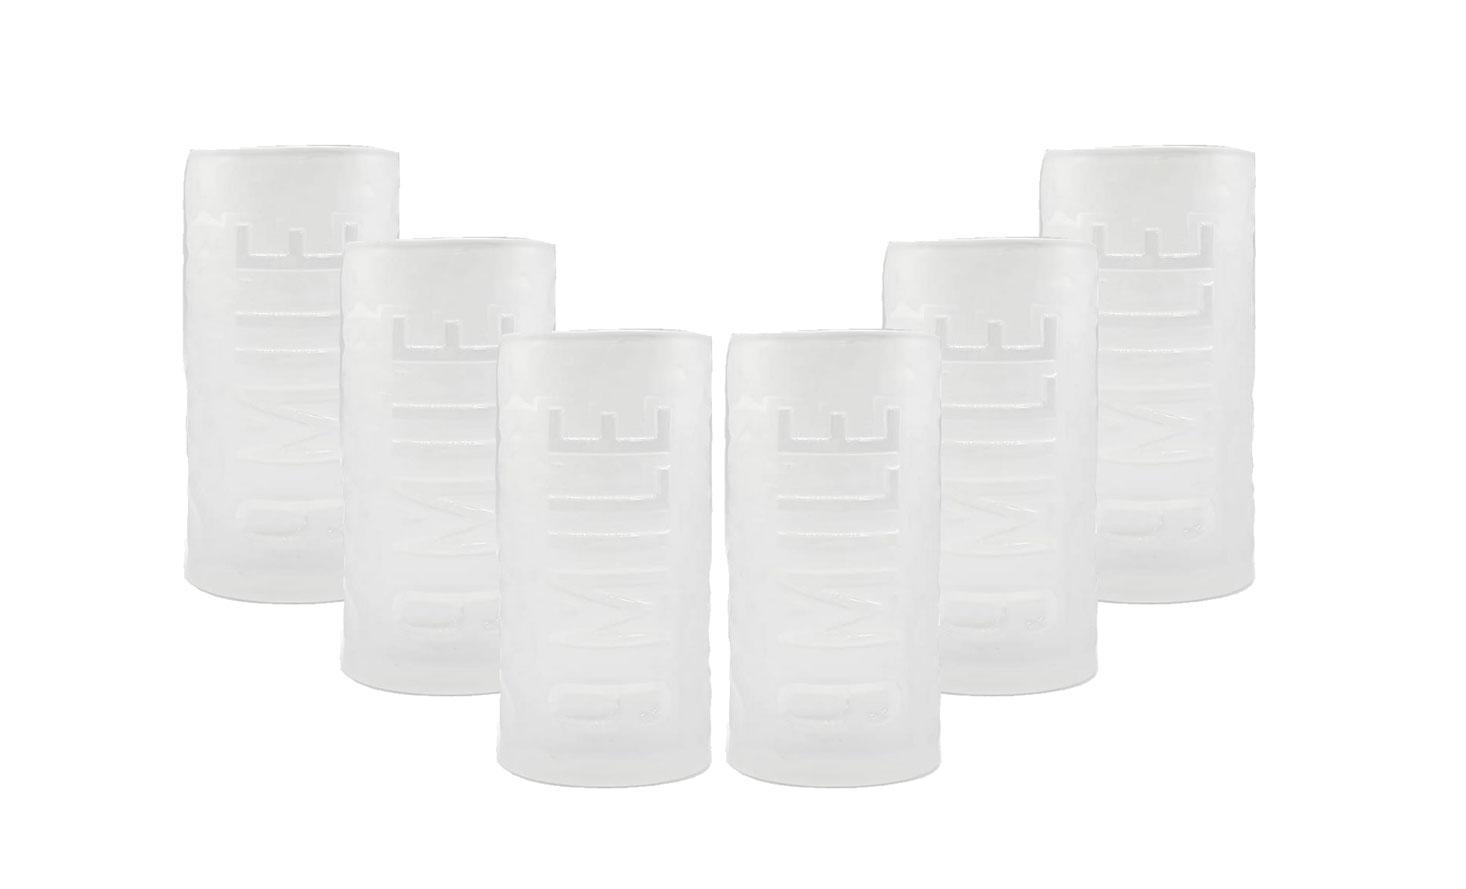 9 Mile - Longdrinkglas / Longdrink Glas / Milchglas  Gläser Set - 6x Longdrinkgläser